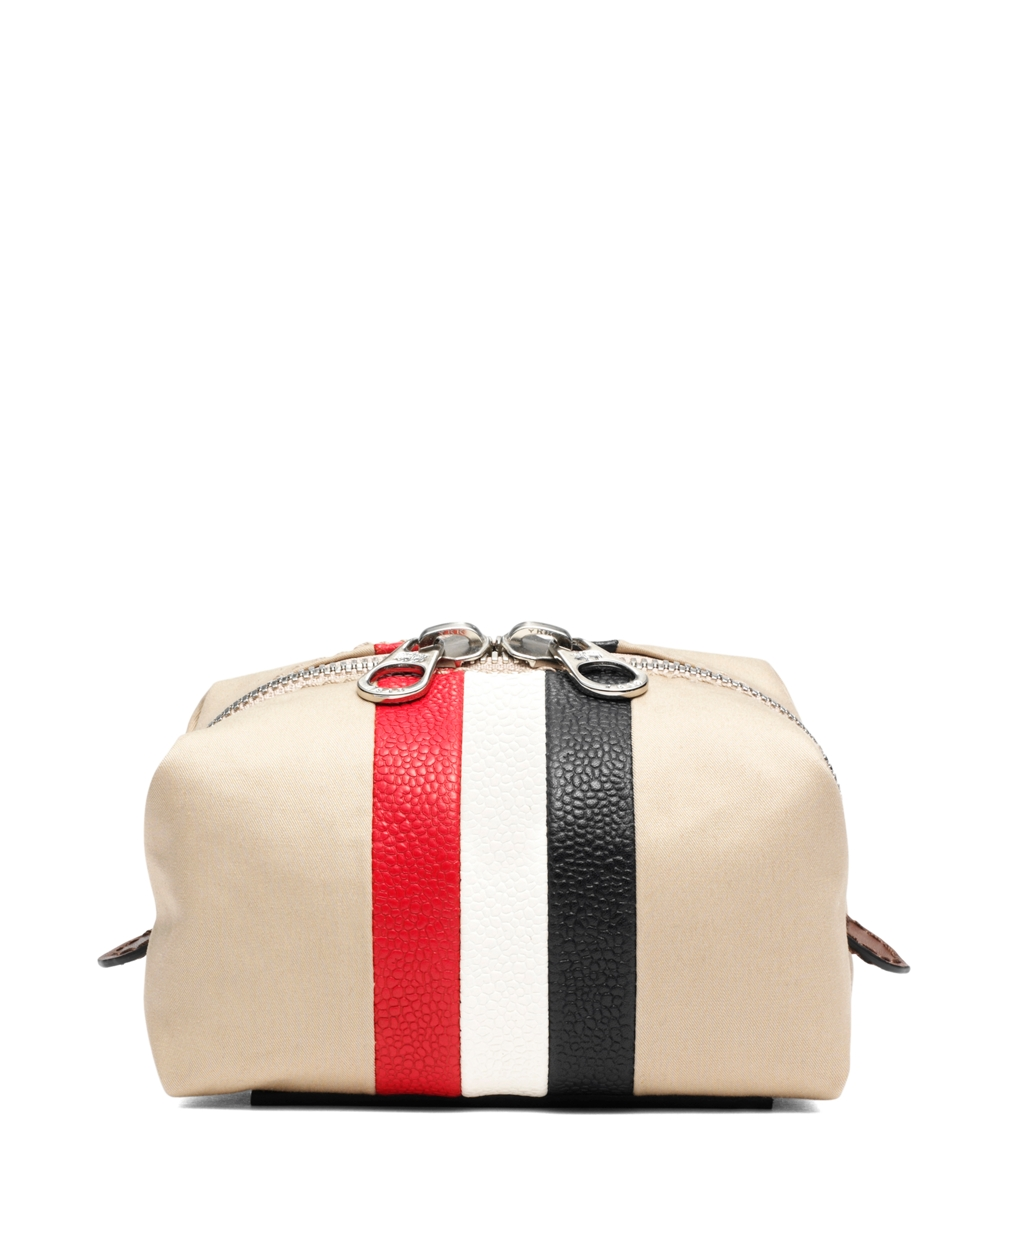 Gucci Men S Travel Kit